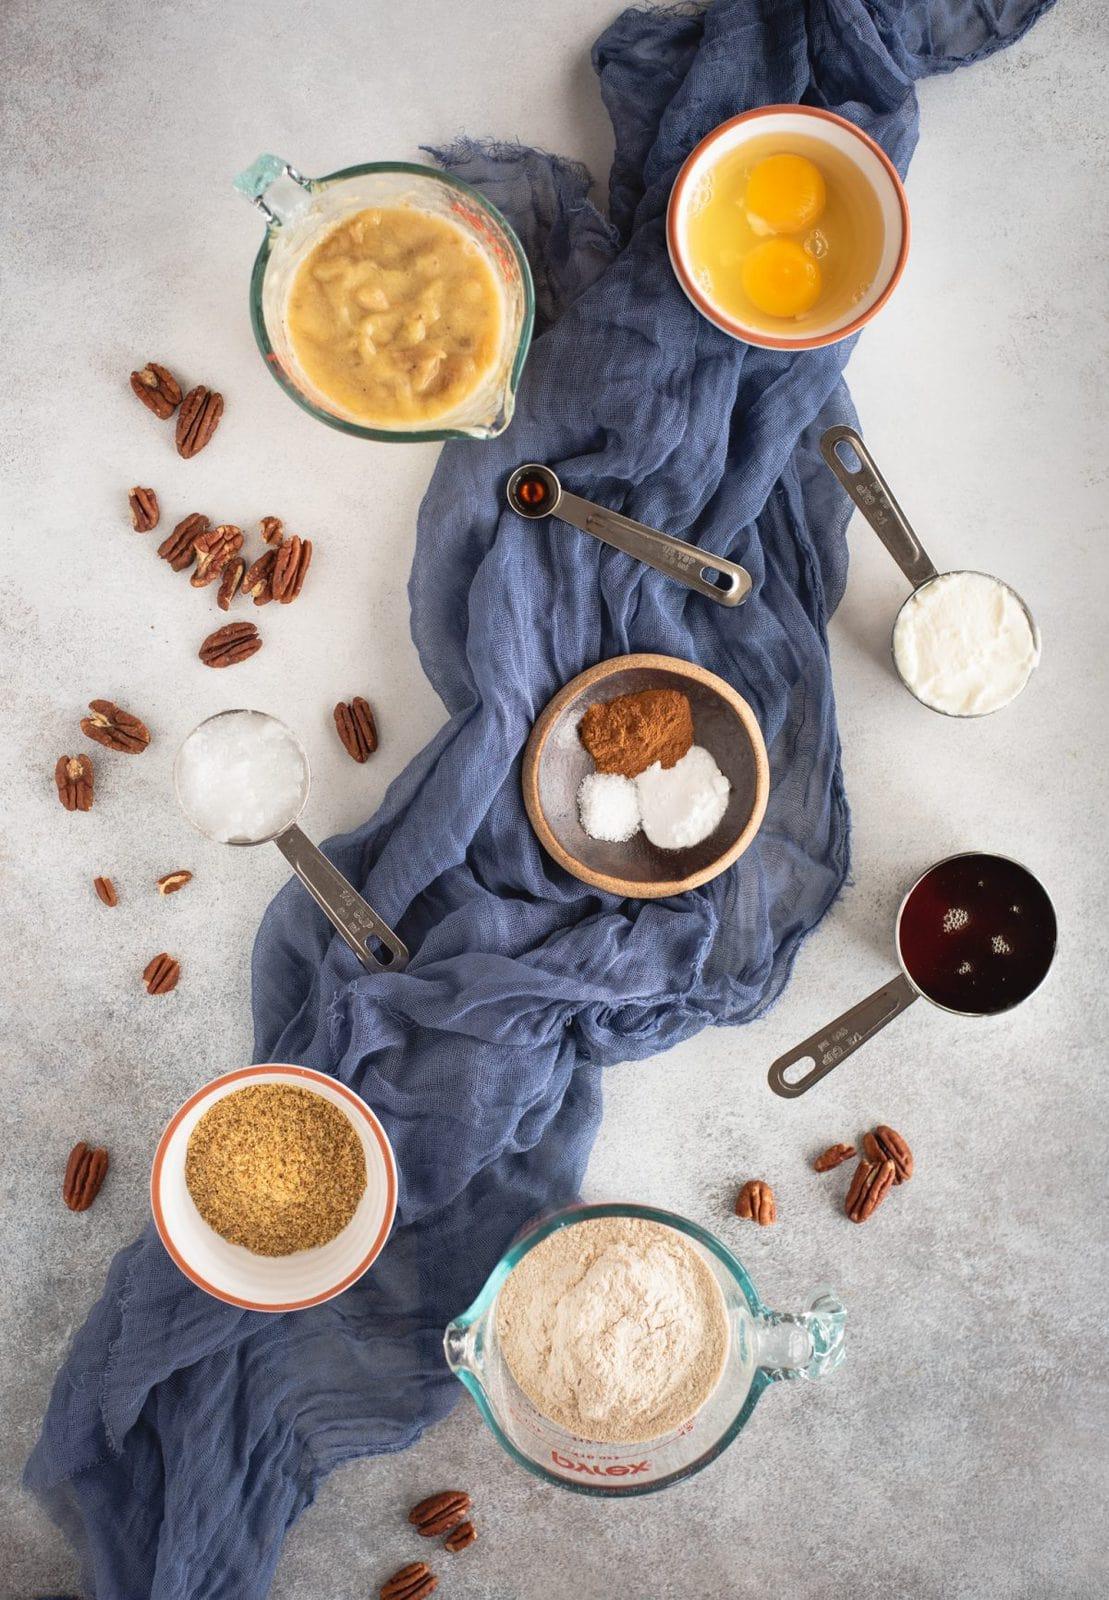 Ingredients for healthy banana bread recipe